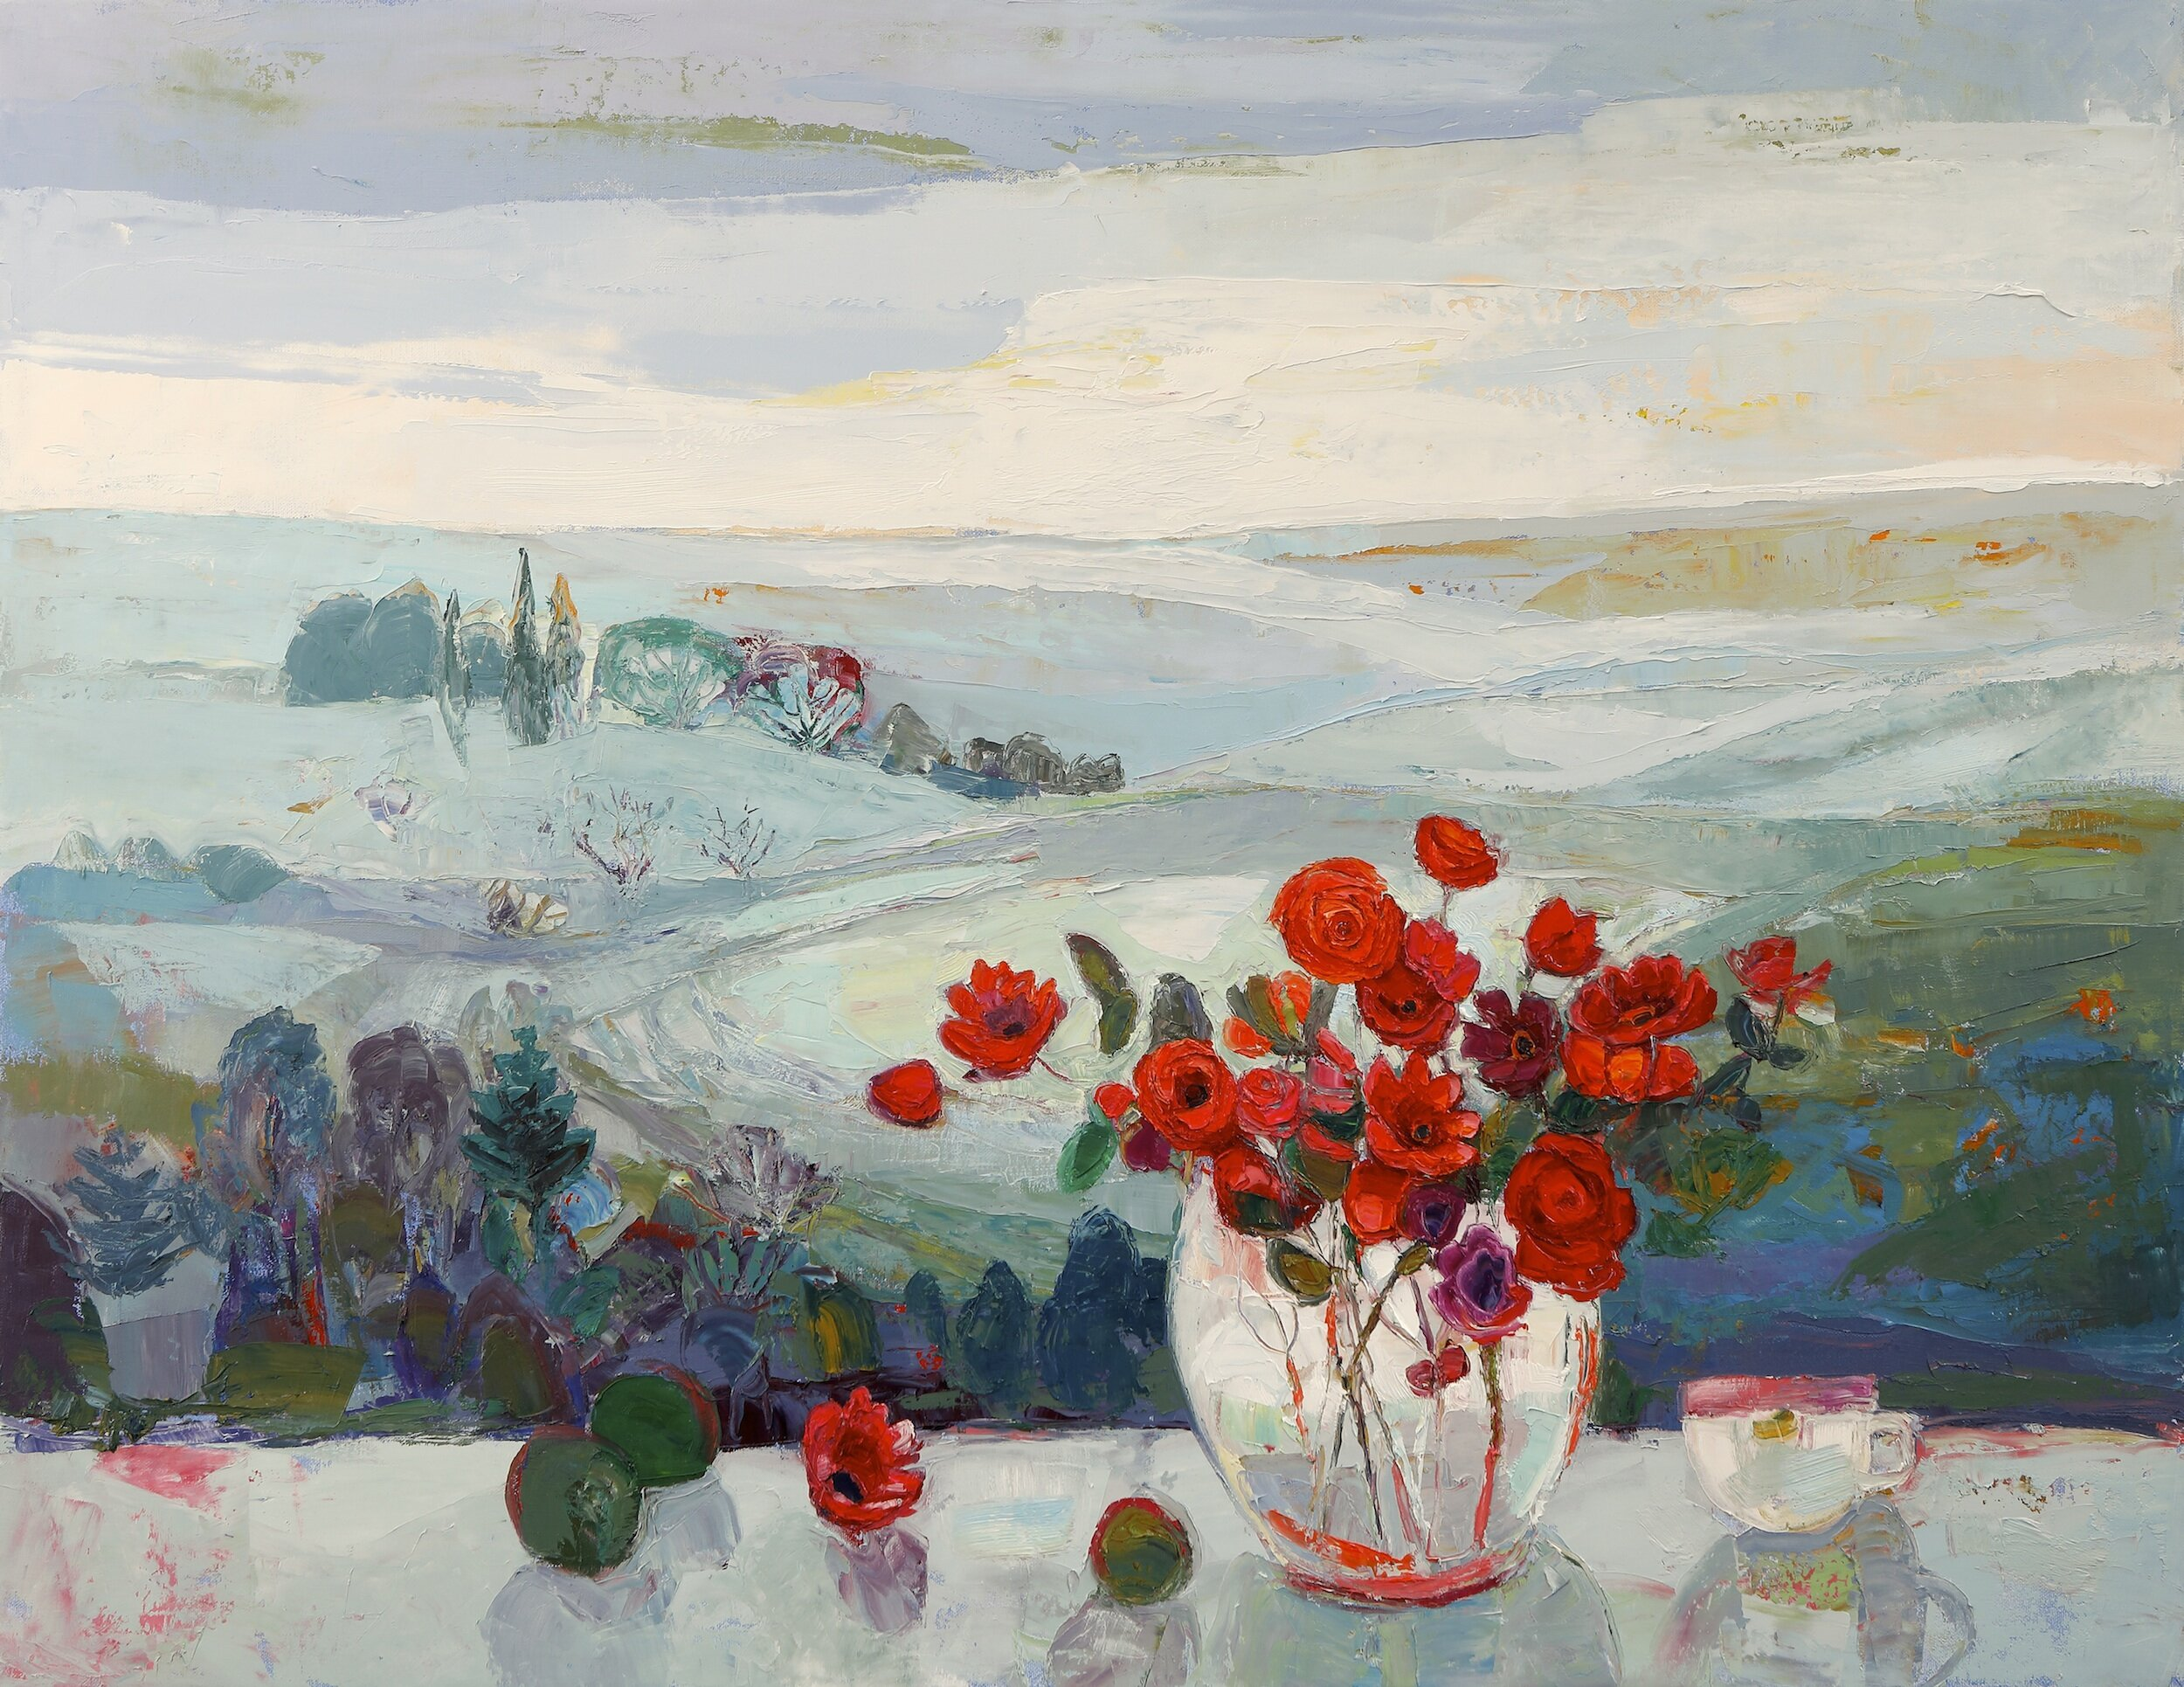 Title: Light on the Horizon  Size: 28x36in  Medium: Oil on Canvas  Price: £5250